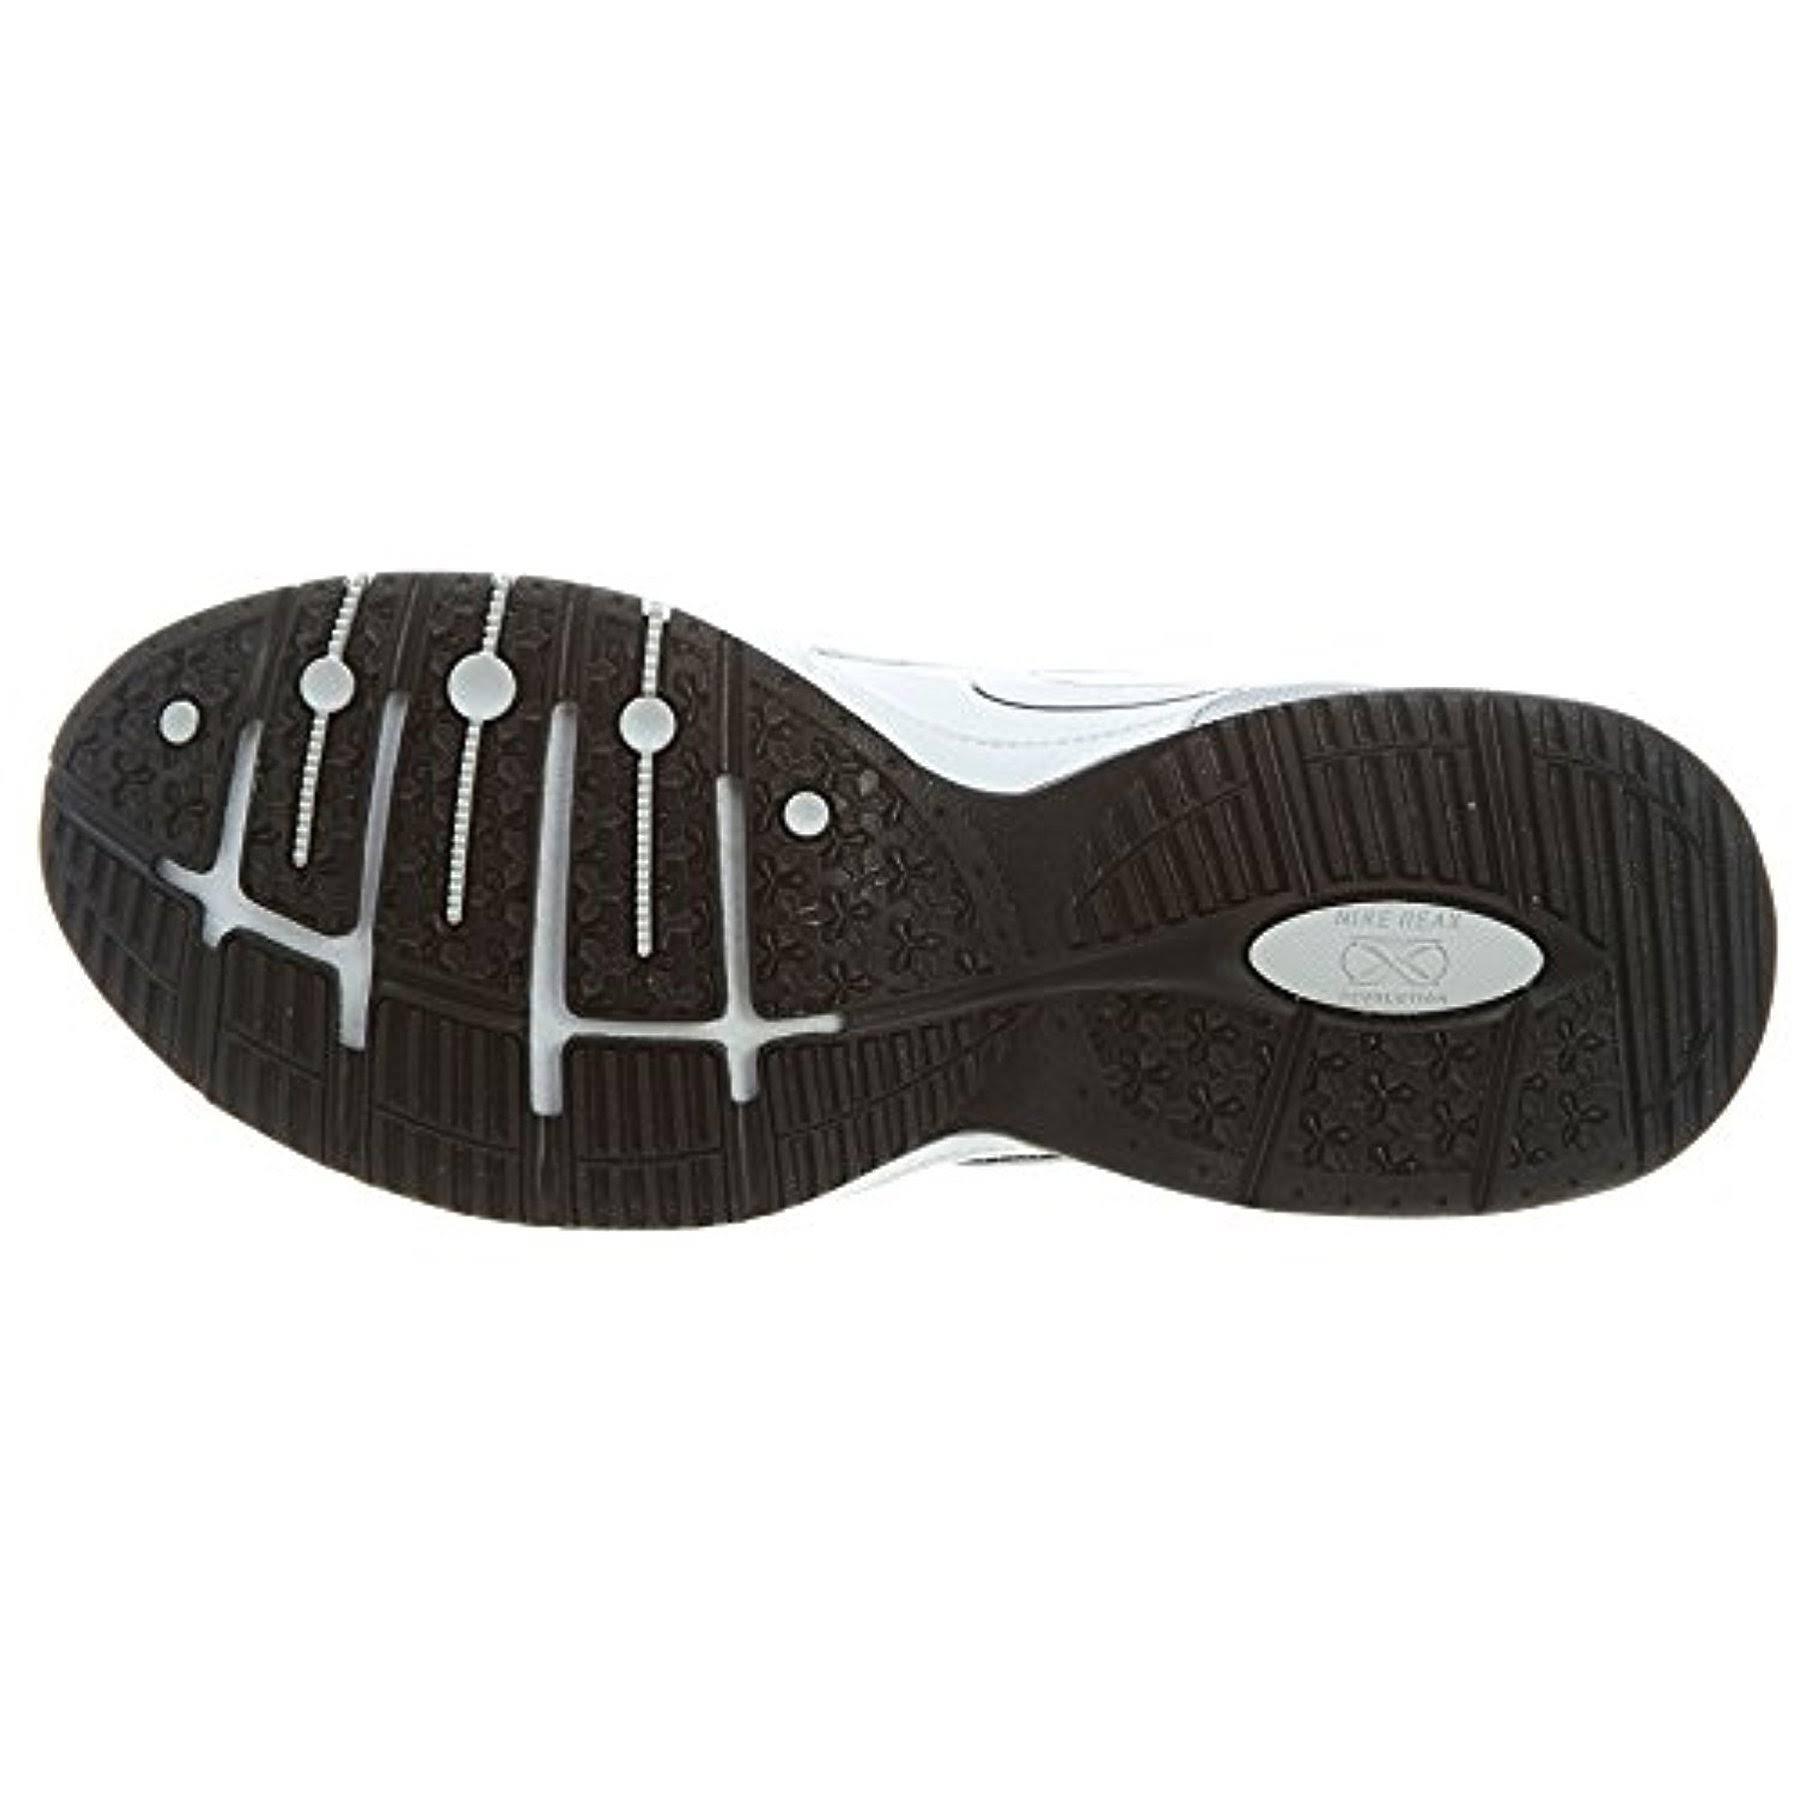 Silver Tr Sl Reax met White 101 333765 Iii Nike AqOnC18wC